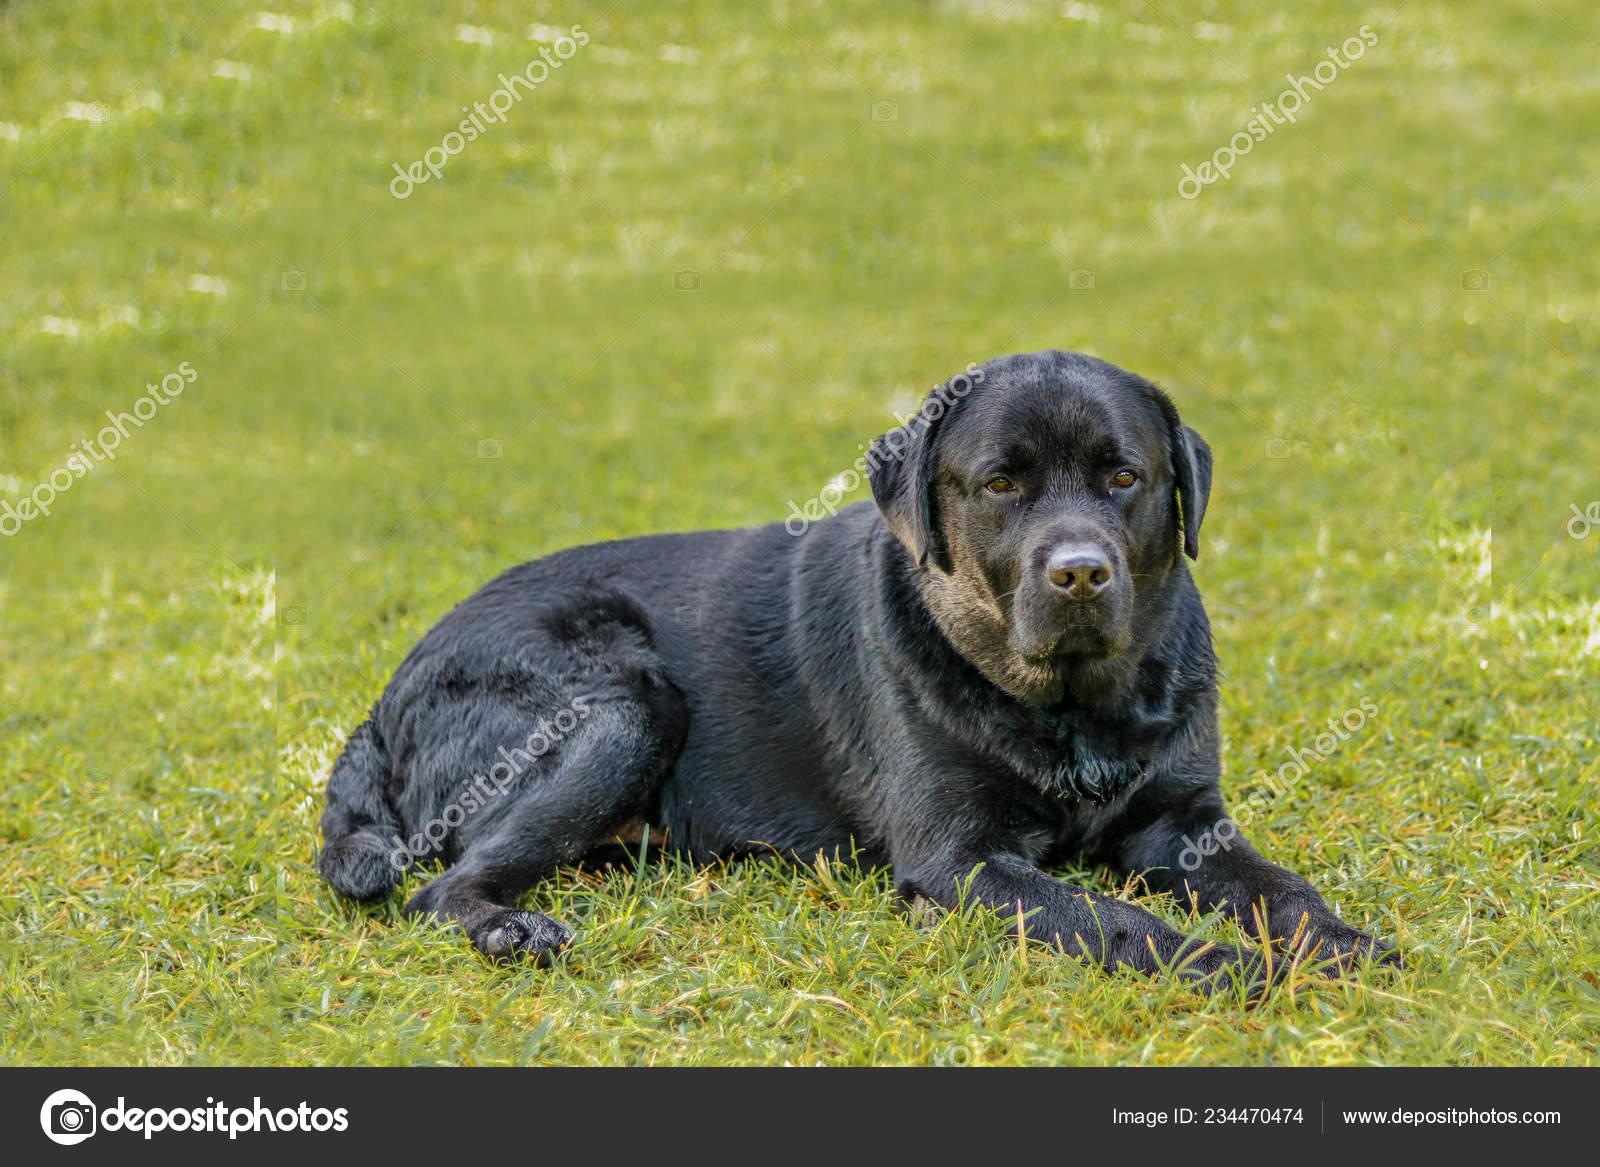 Photos Lebra Dogs Lebra Black Dog Setting Relex Lawn Green Background Stock Photo C Virenders800 234470474